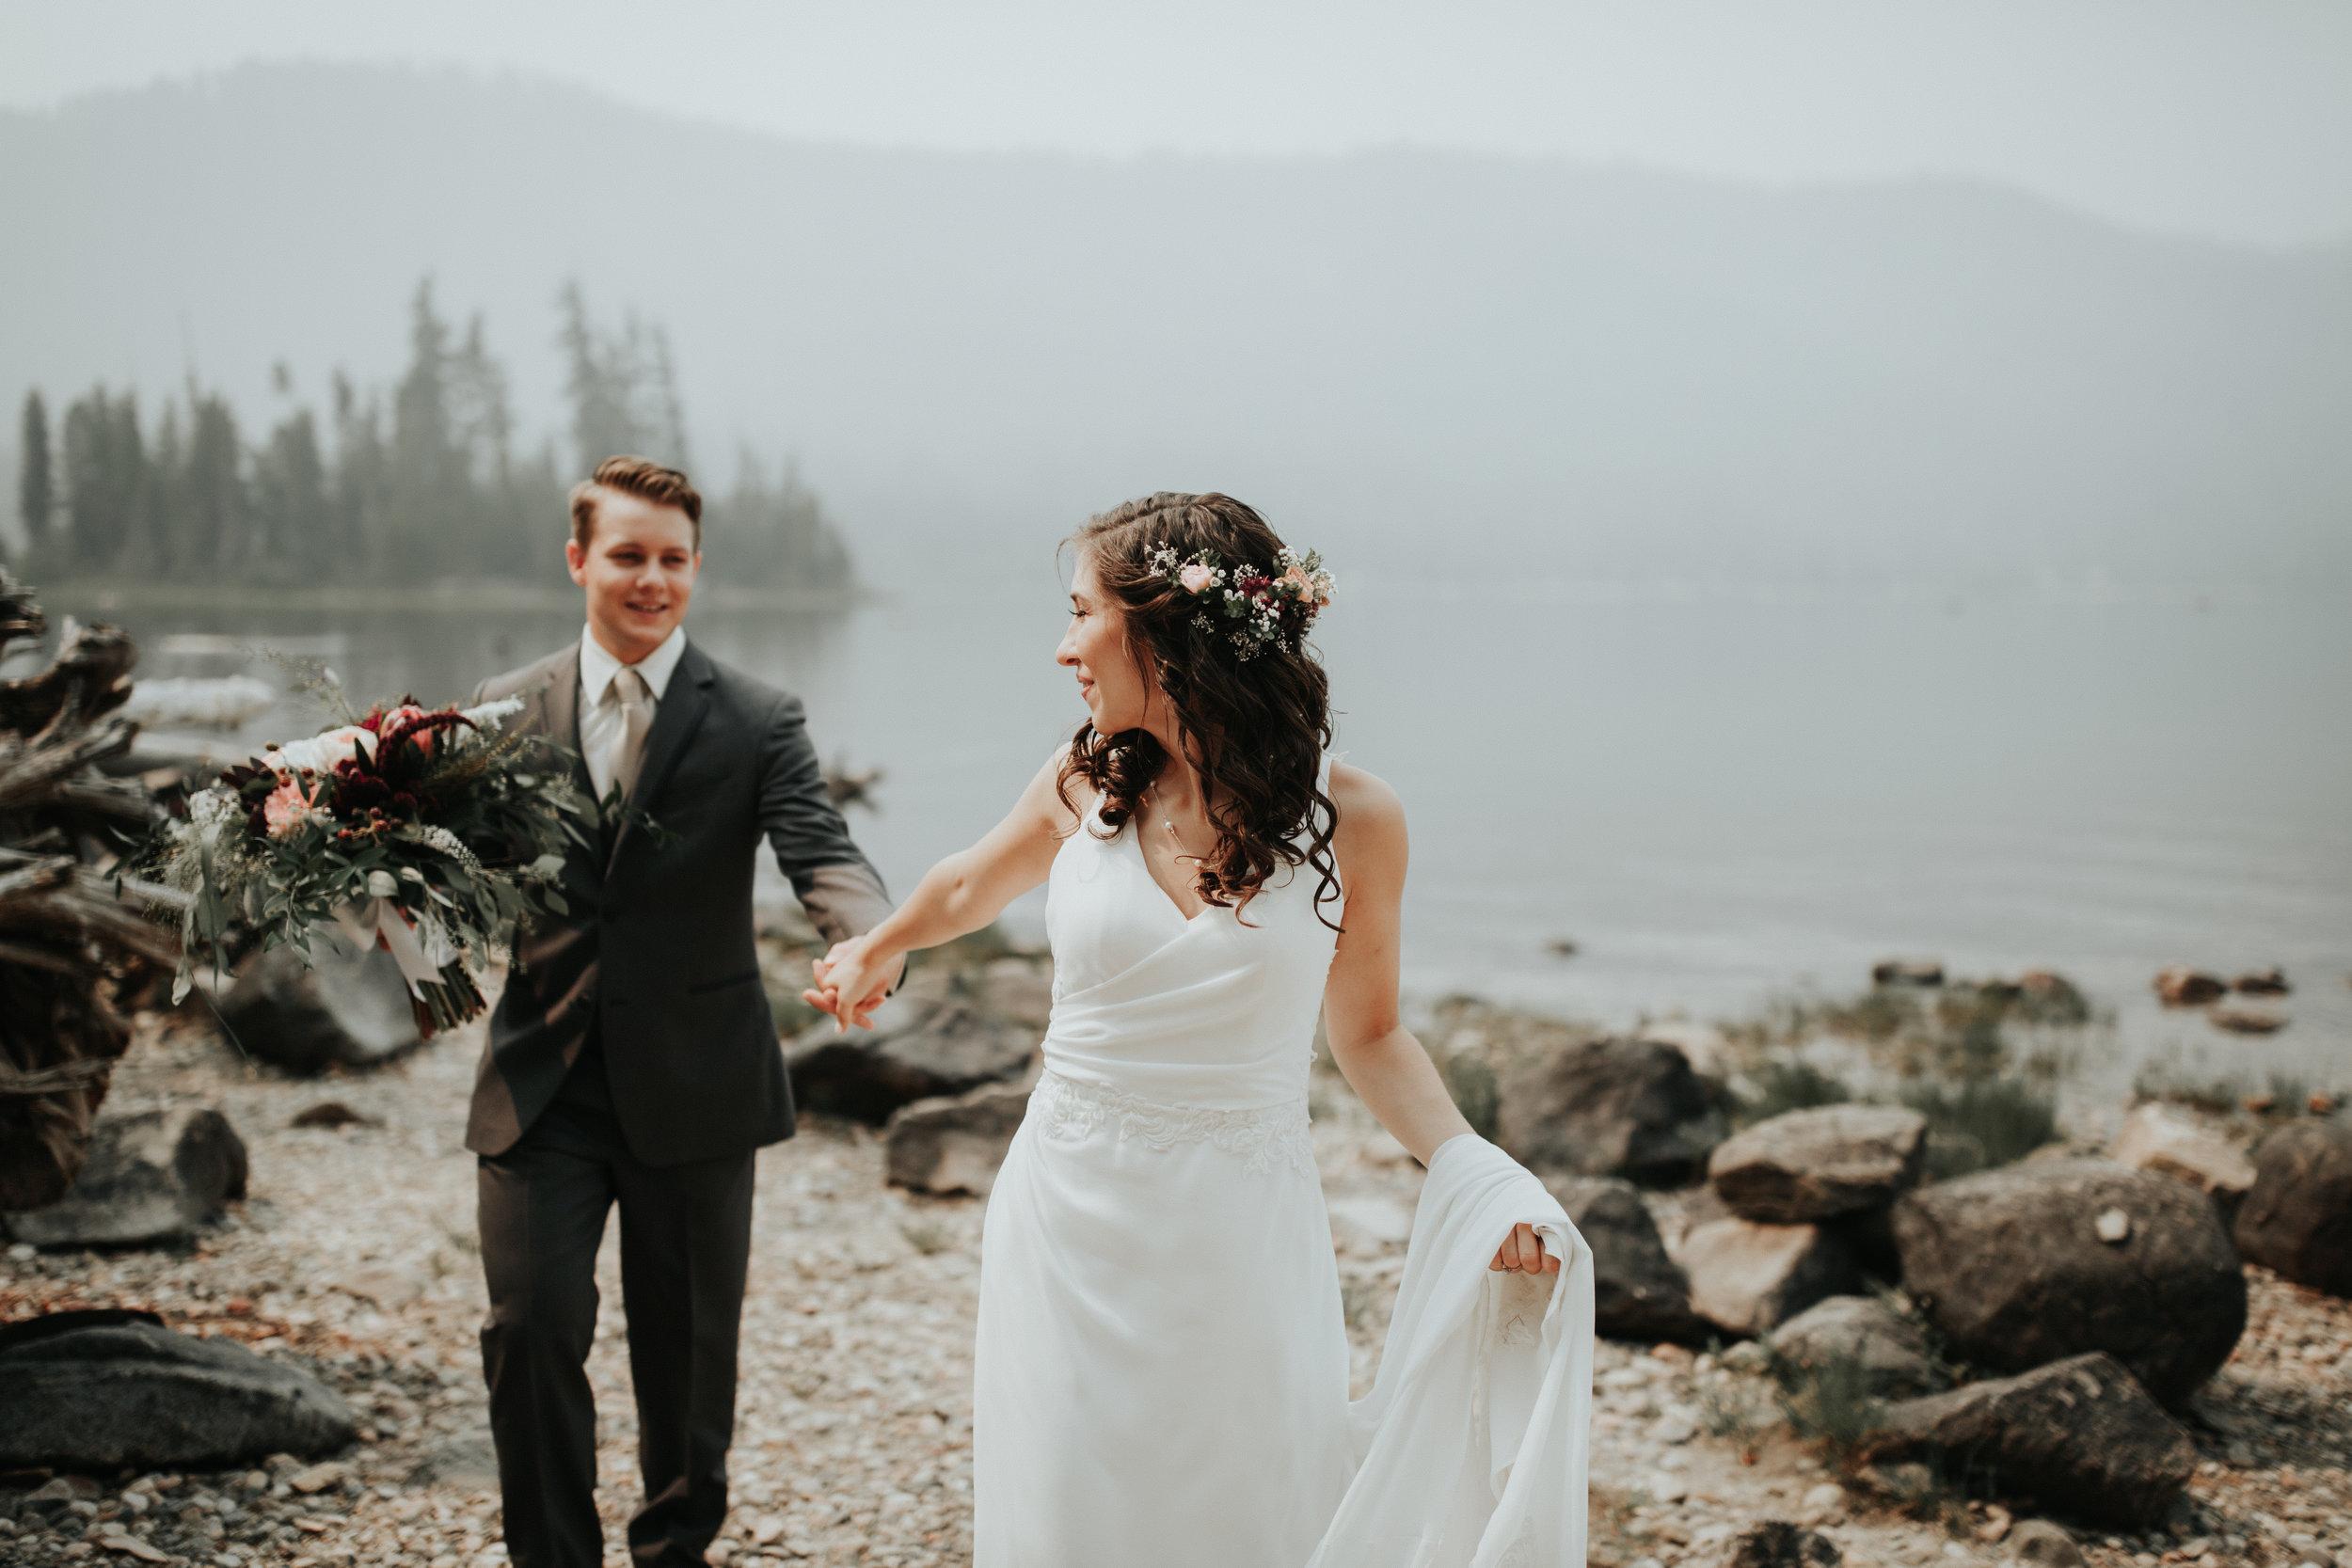 Adam Loves Ally - © 2016Genre: Soft RockTheme: Wedding/Proposal